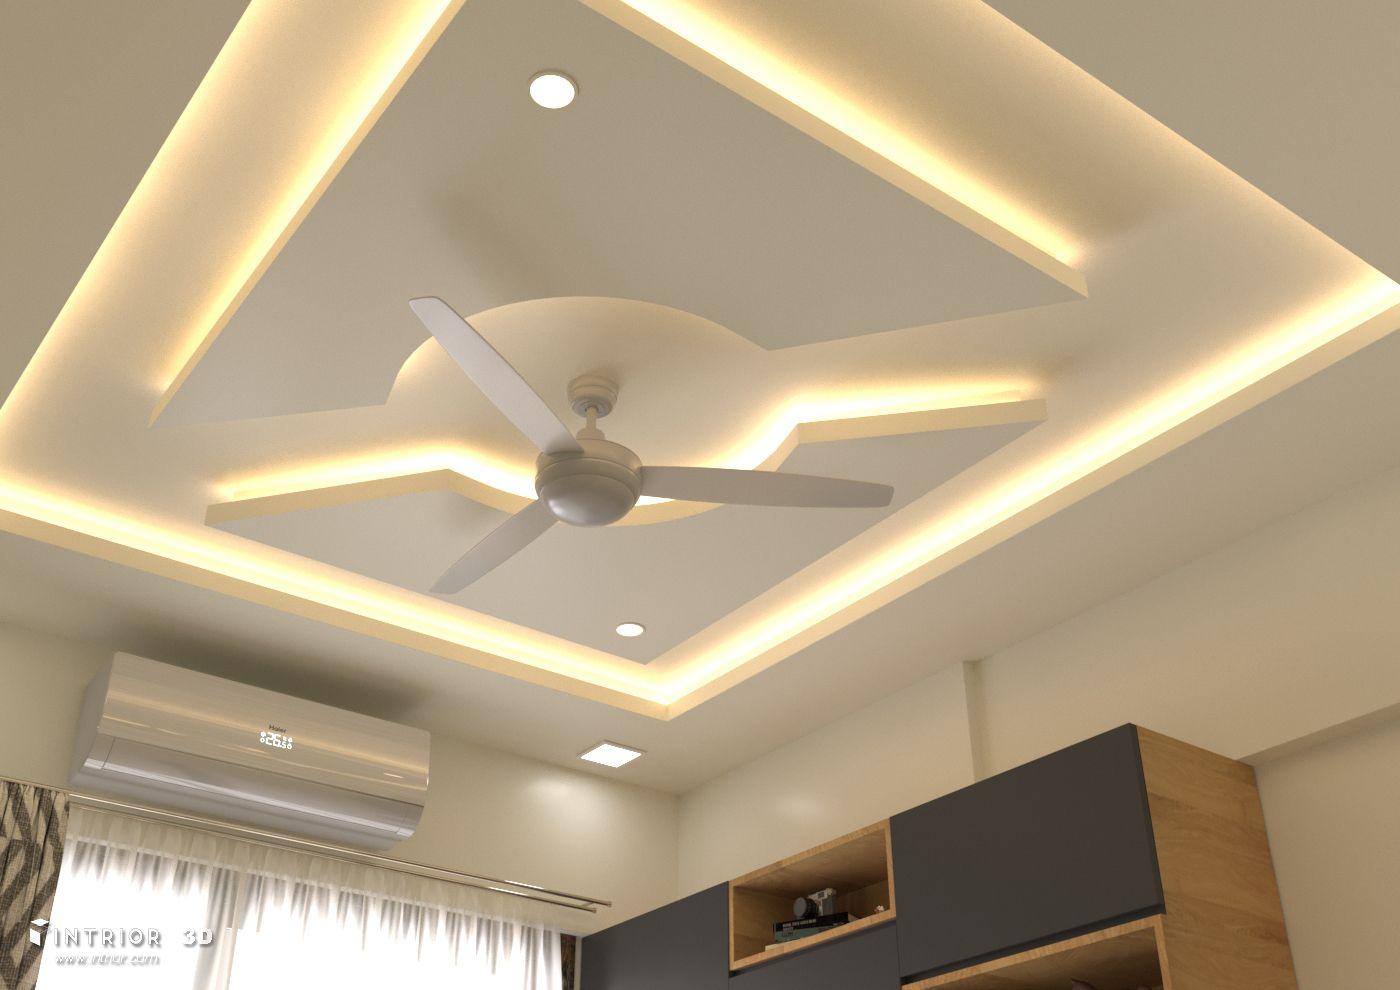 Pin By Alex Ortega On Techo Drywall Bedroom False Ceiling Design